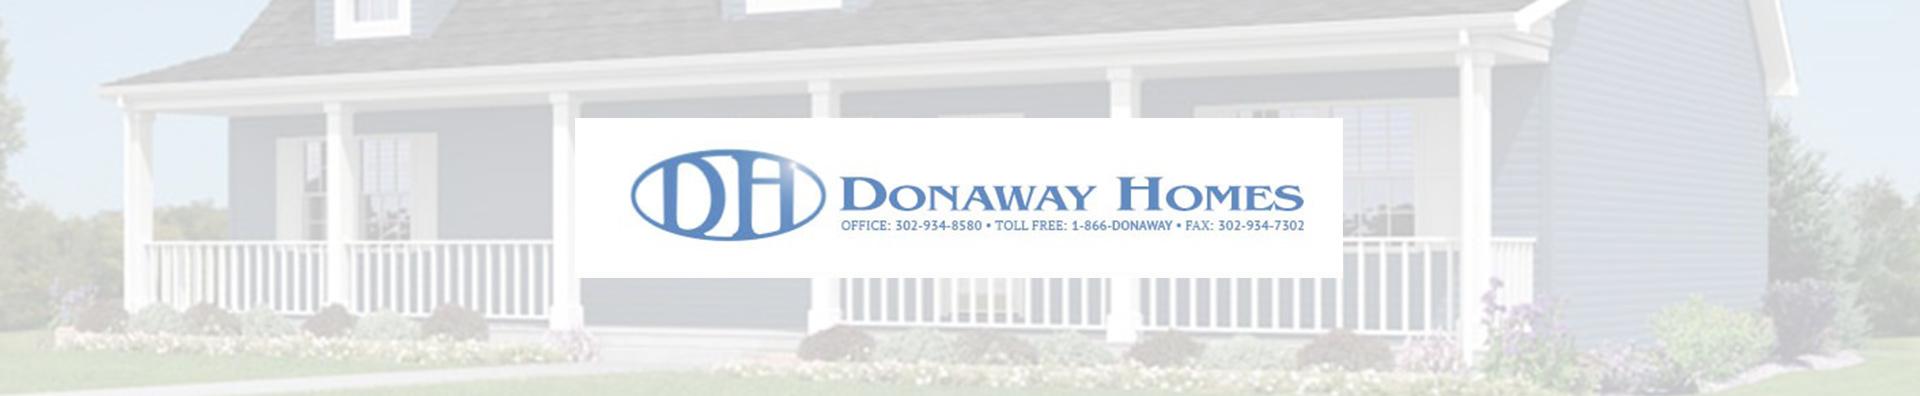 Donaway Homes